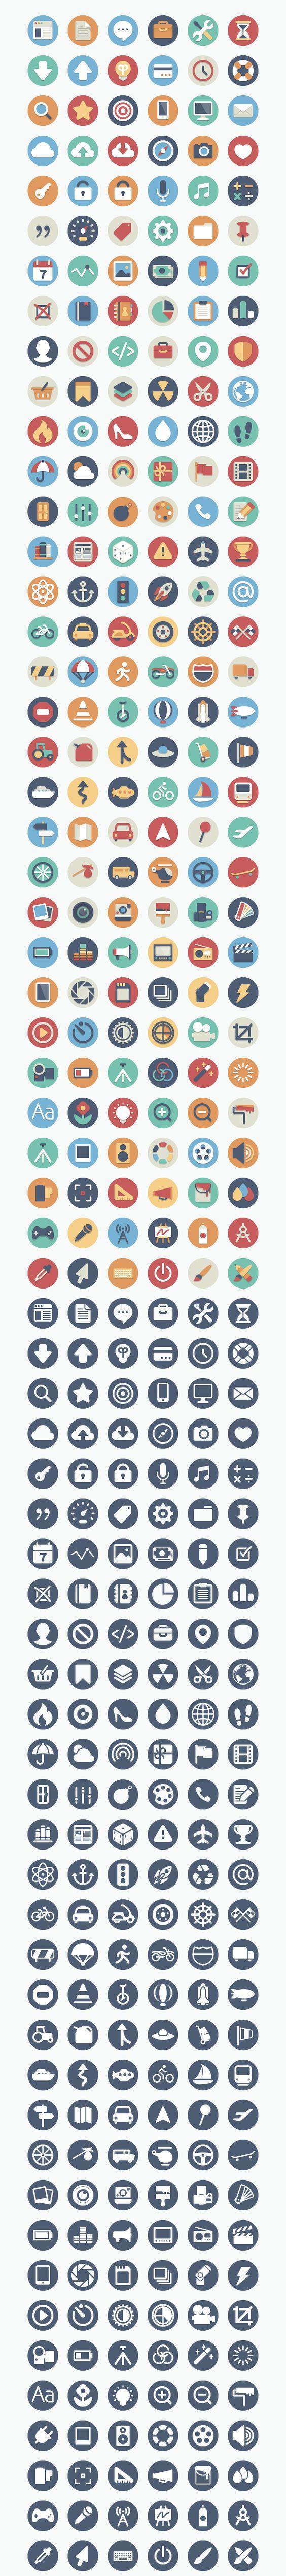 flat-icons1.png (imagem PNG, 600 × 5398 pixels)